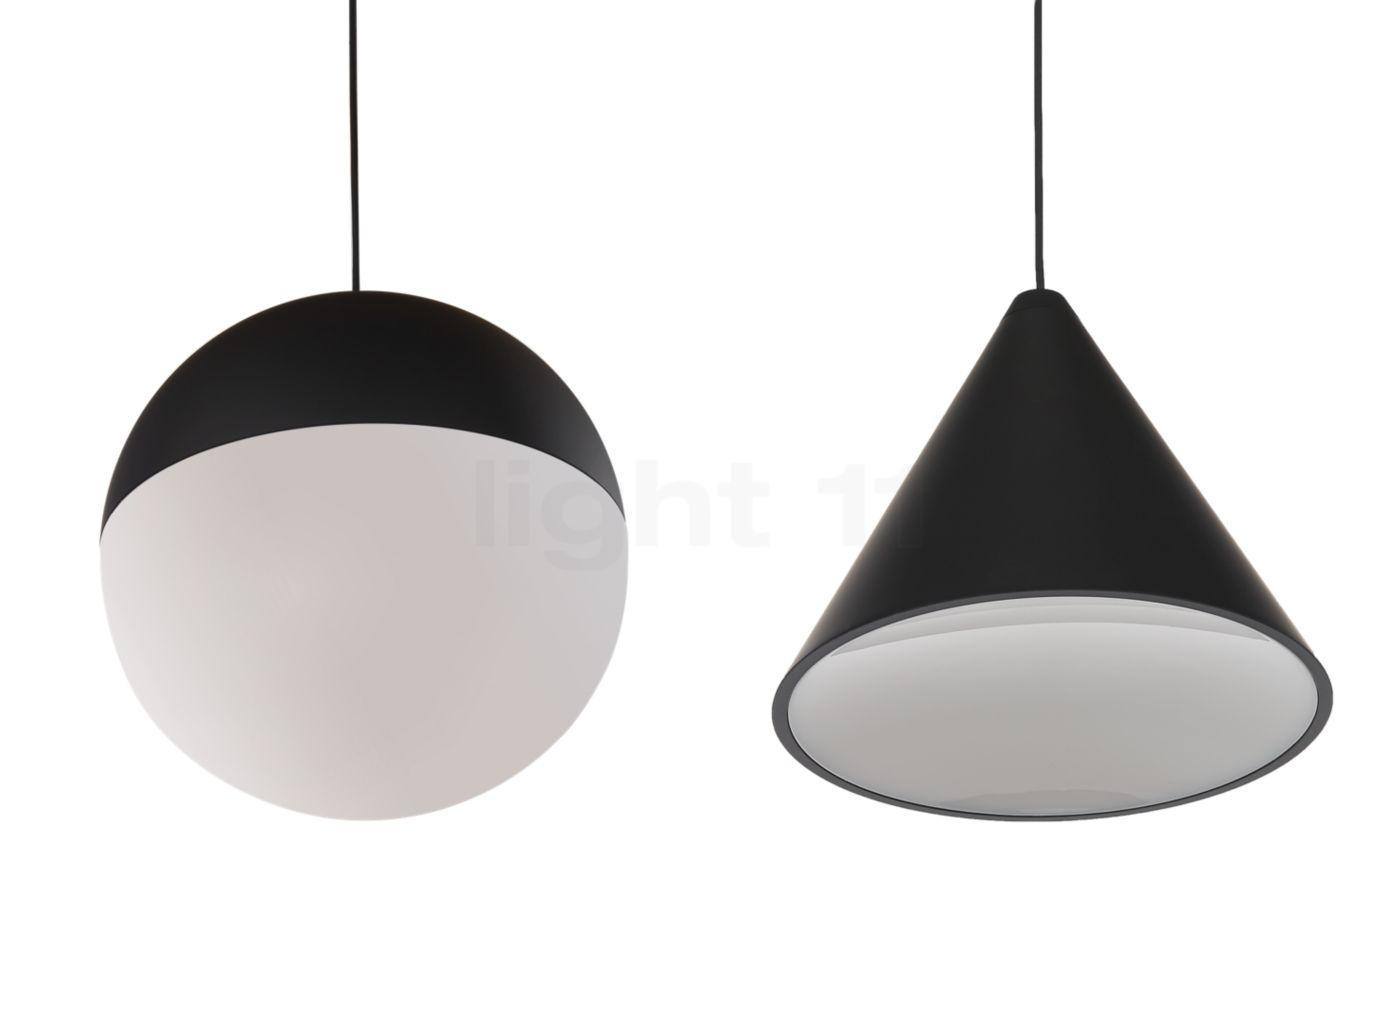 Flos Plafoniere Soffitto : Flos string light